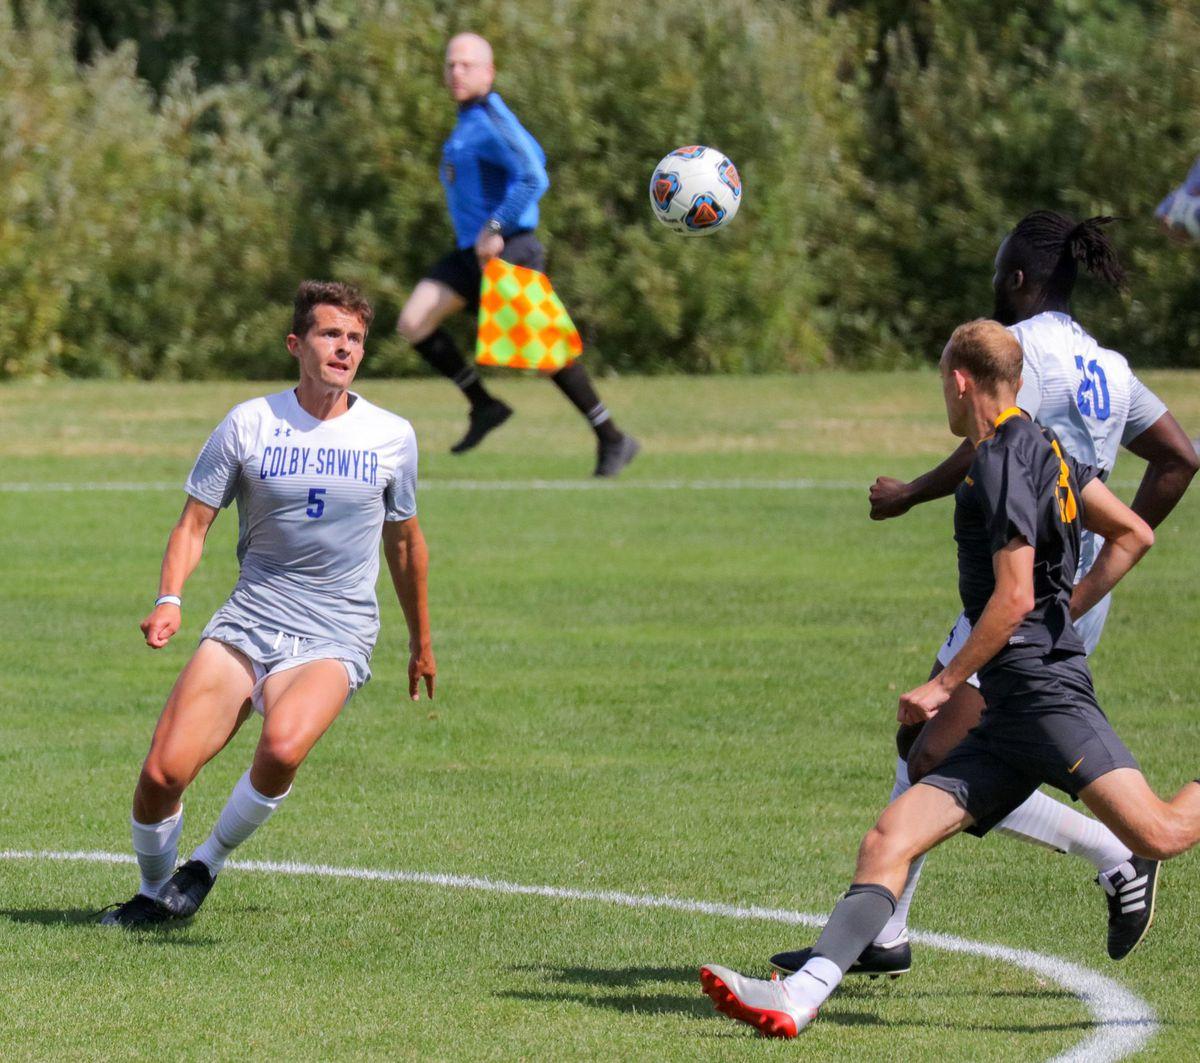 Couper Gunn playing soccer.